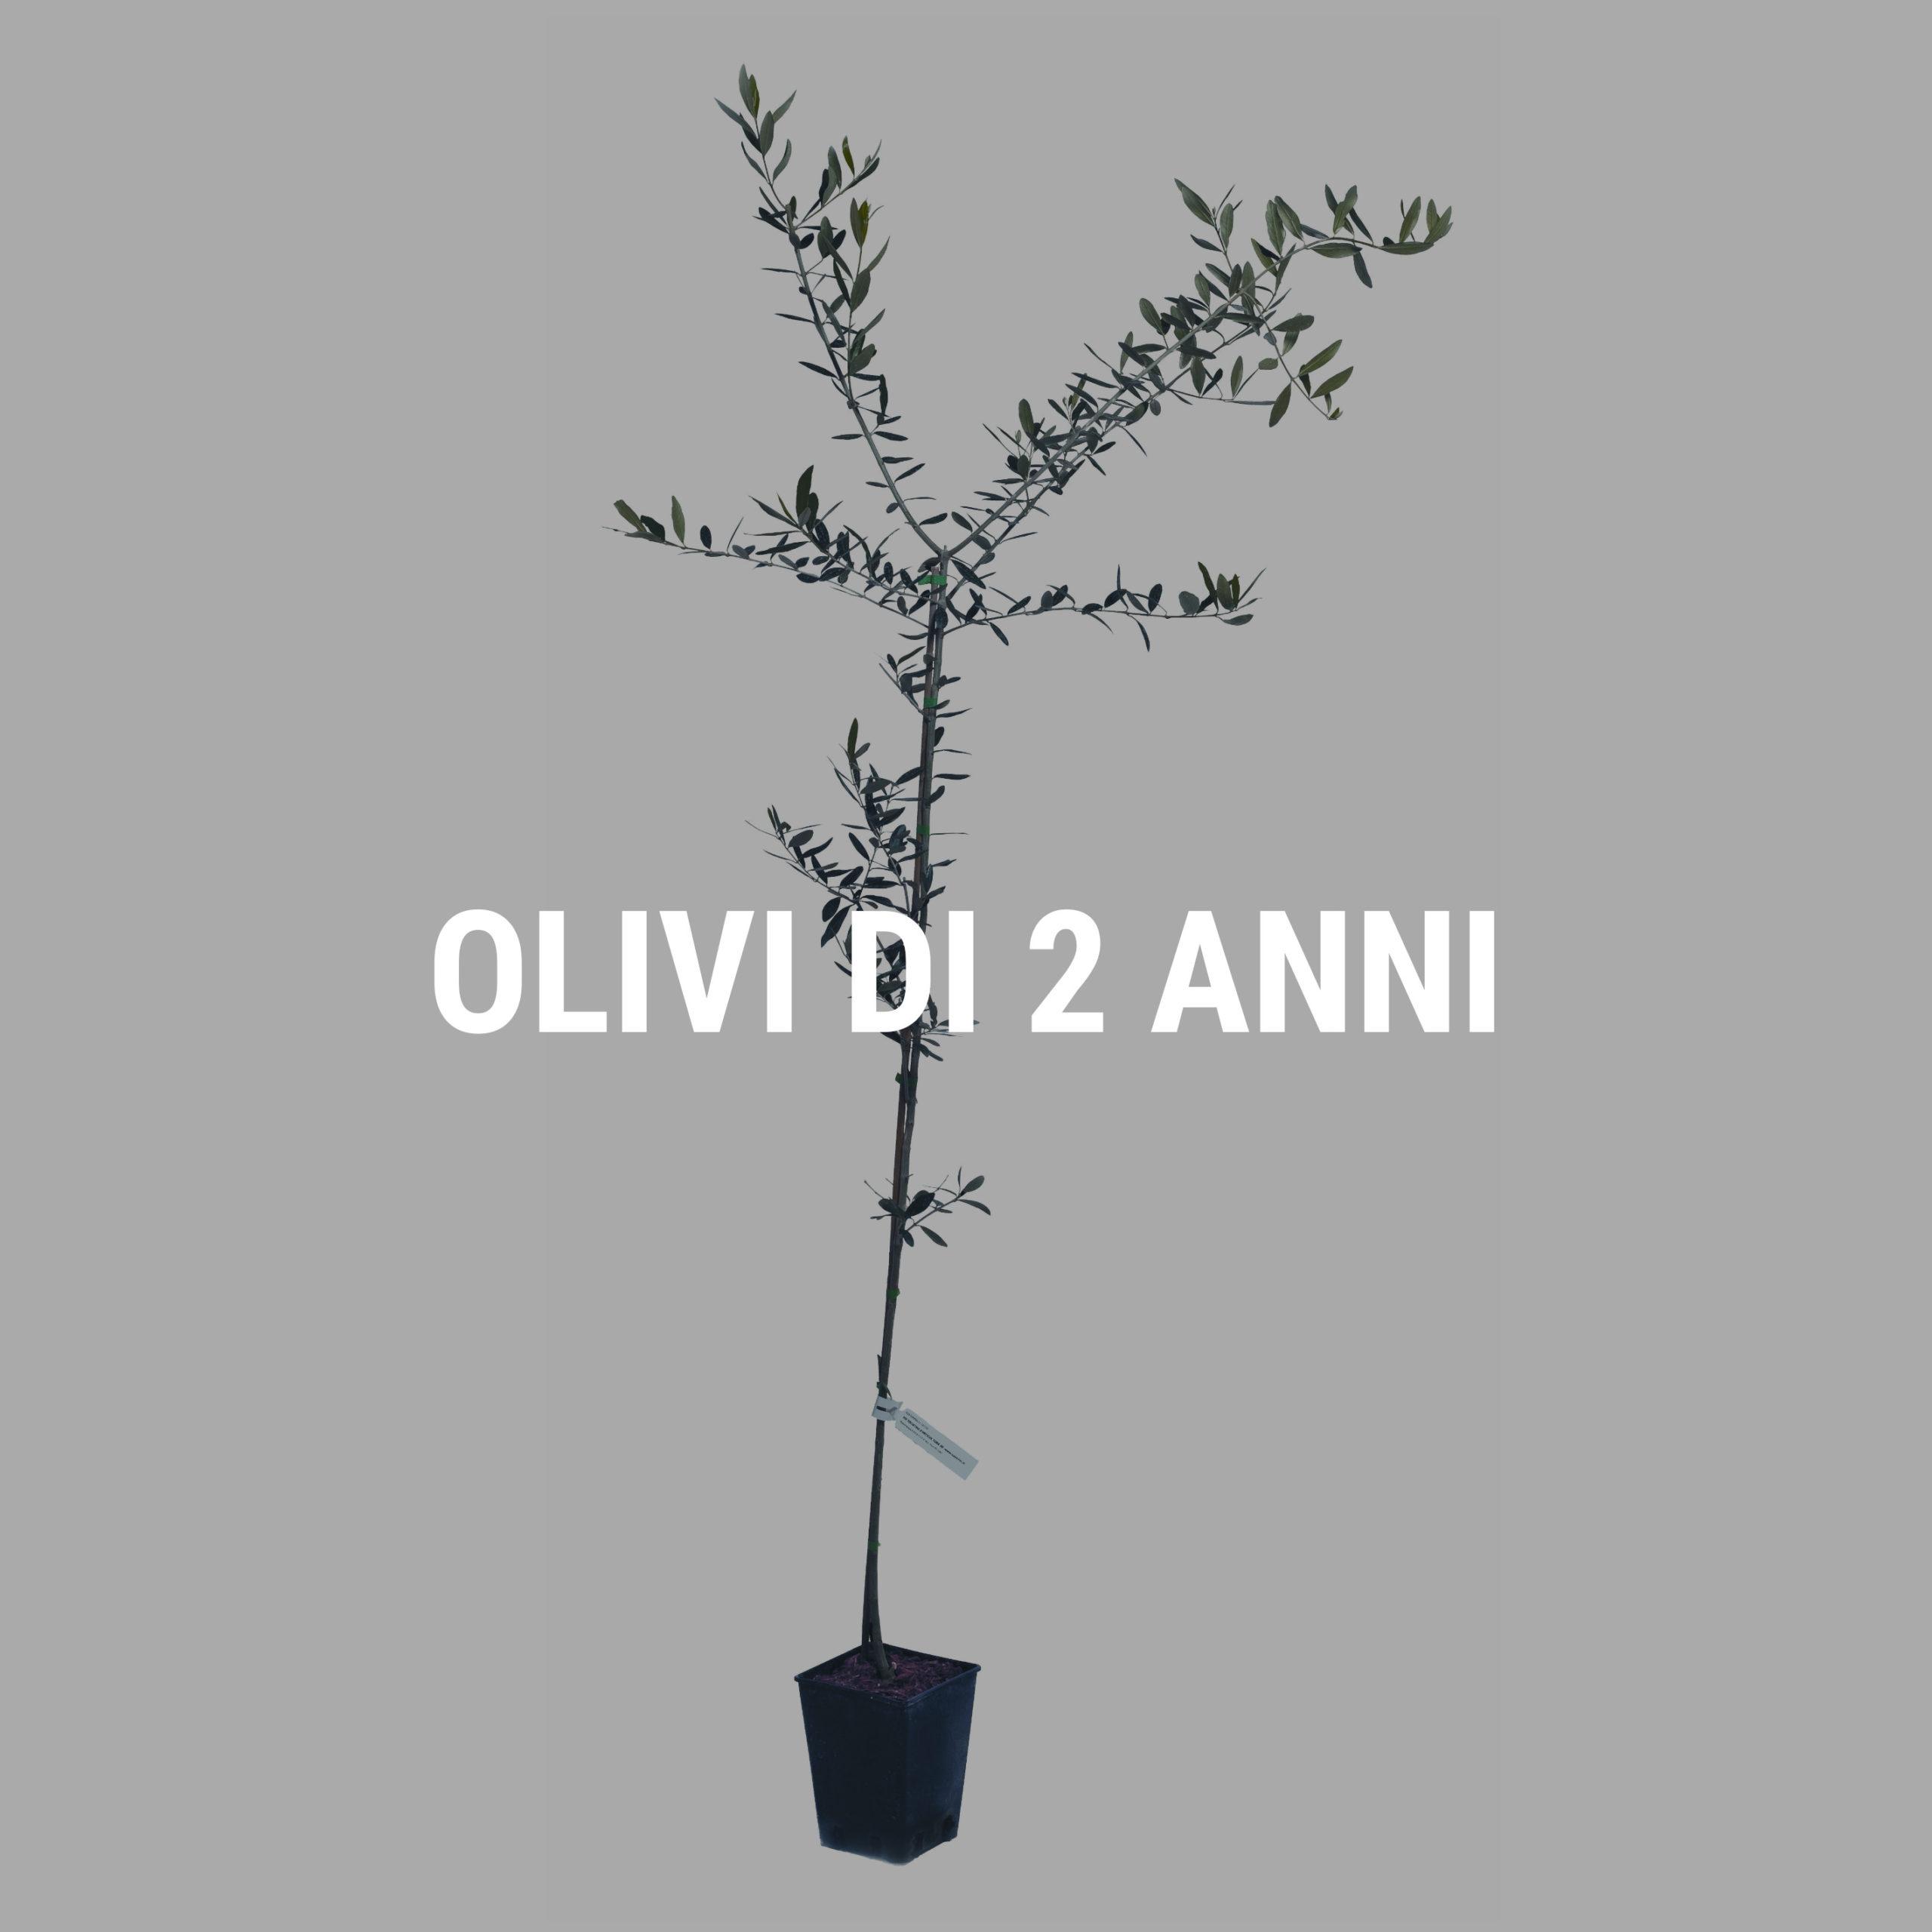 http://www.spoolivi.com/wp-content/uploads/2021/03/olivi_2_anni-2-scaled.jpg